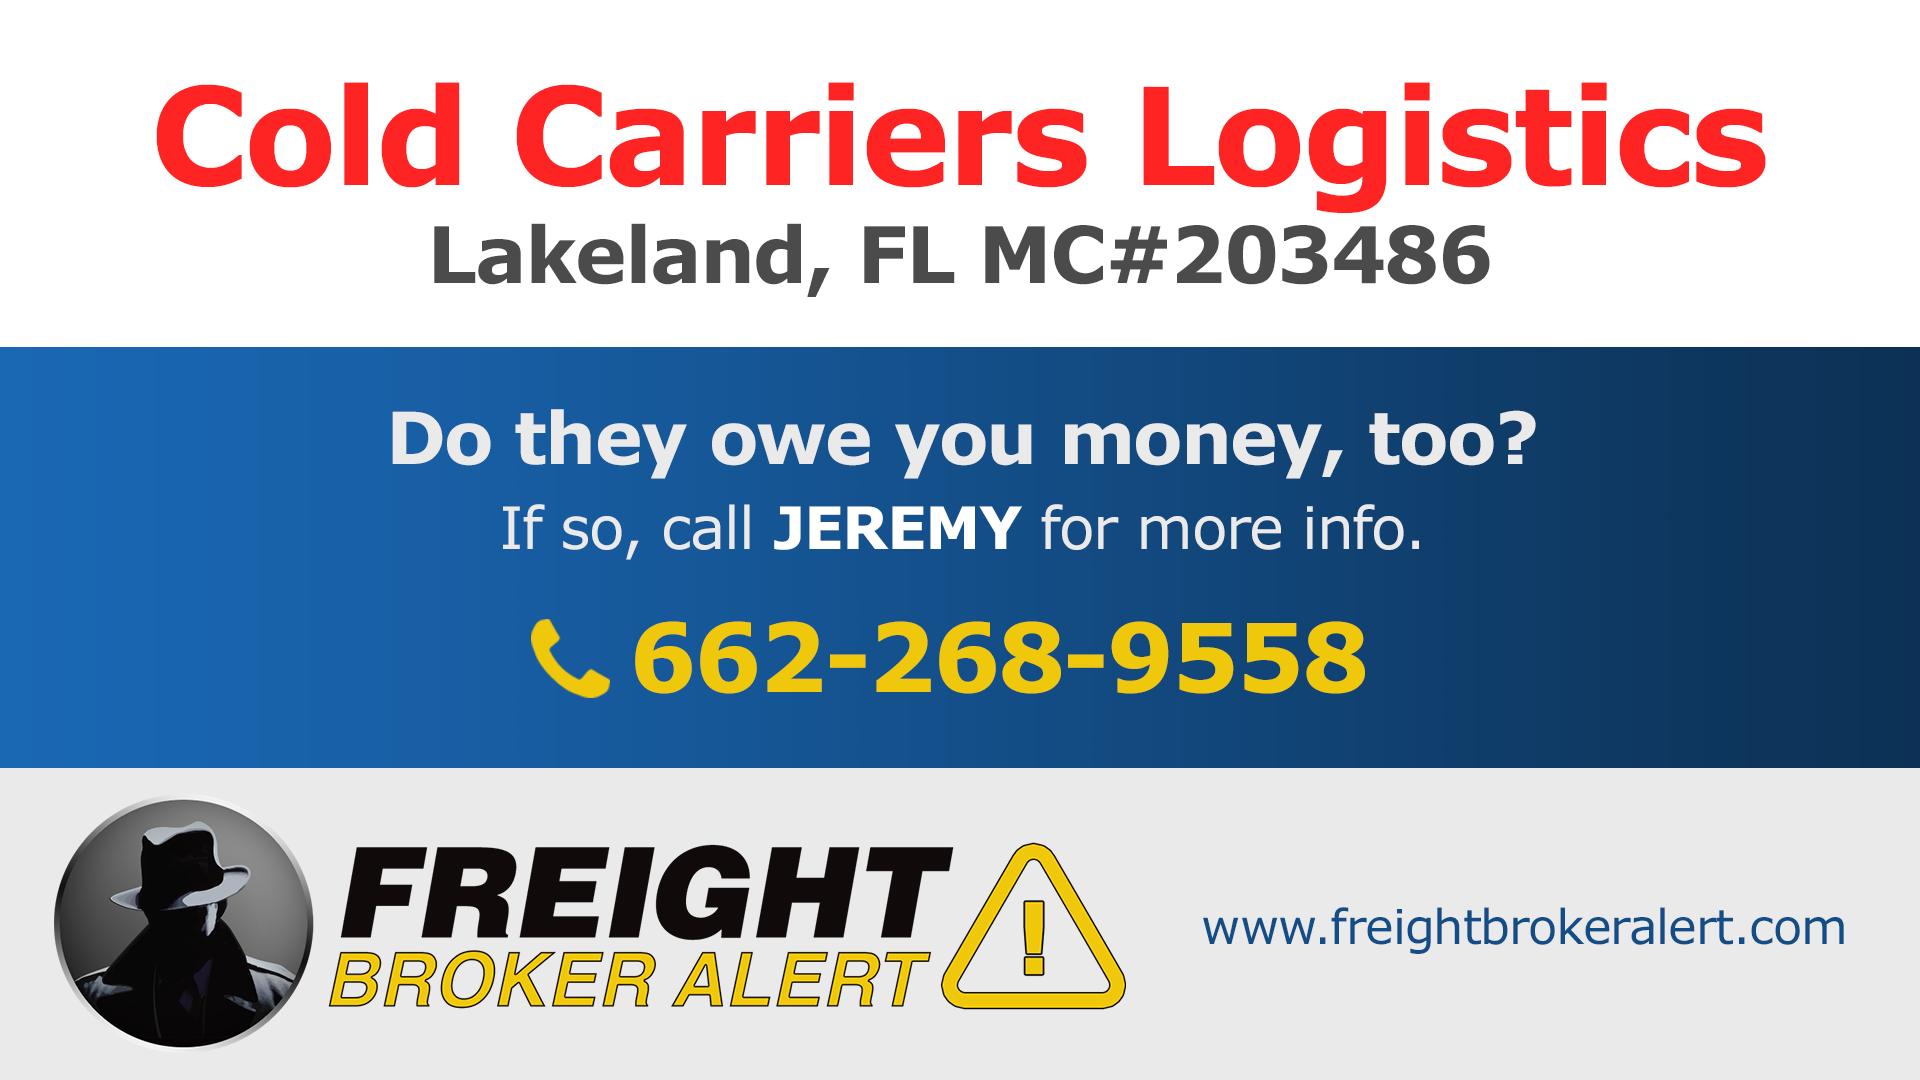 Cold Carriers Logistics LLC Florida